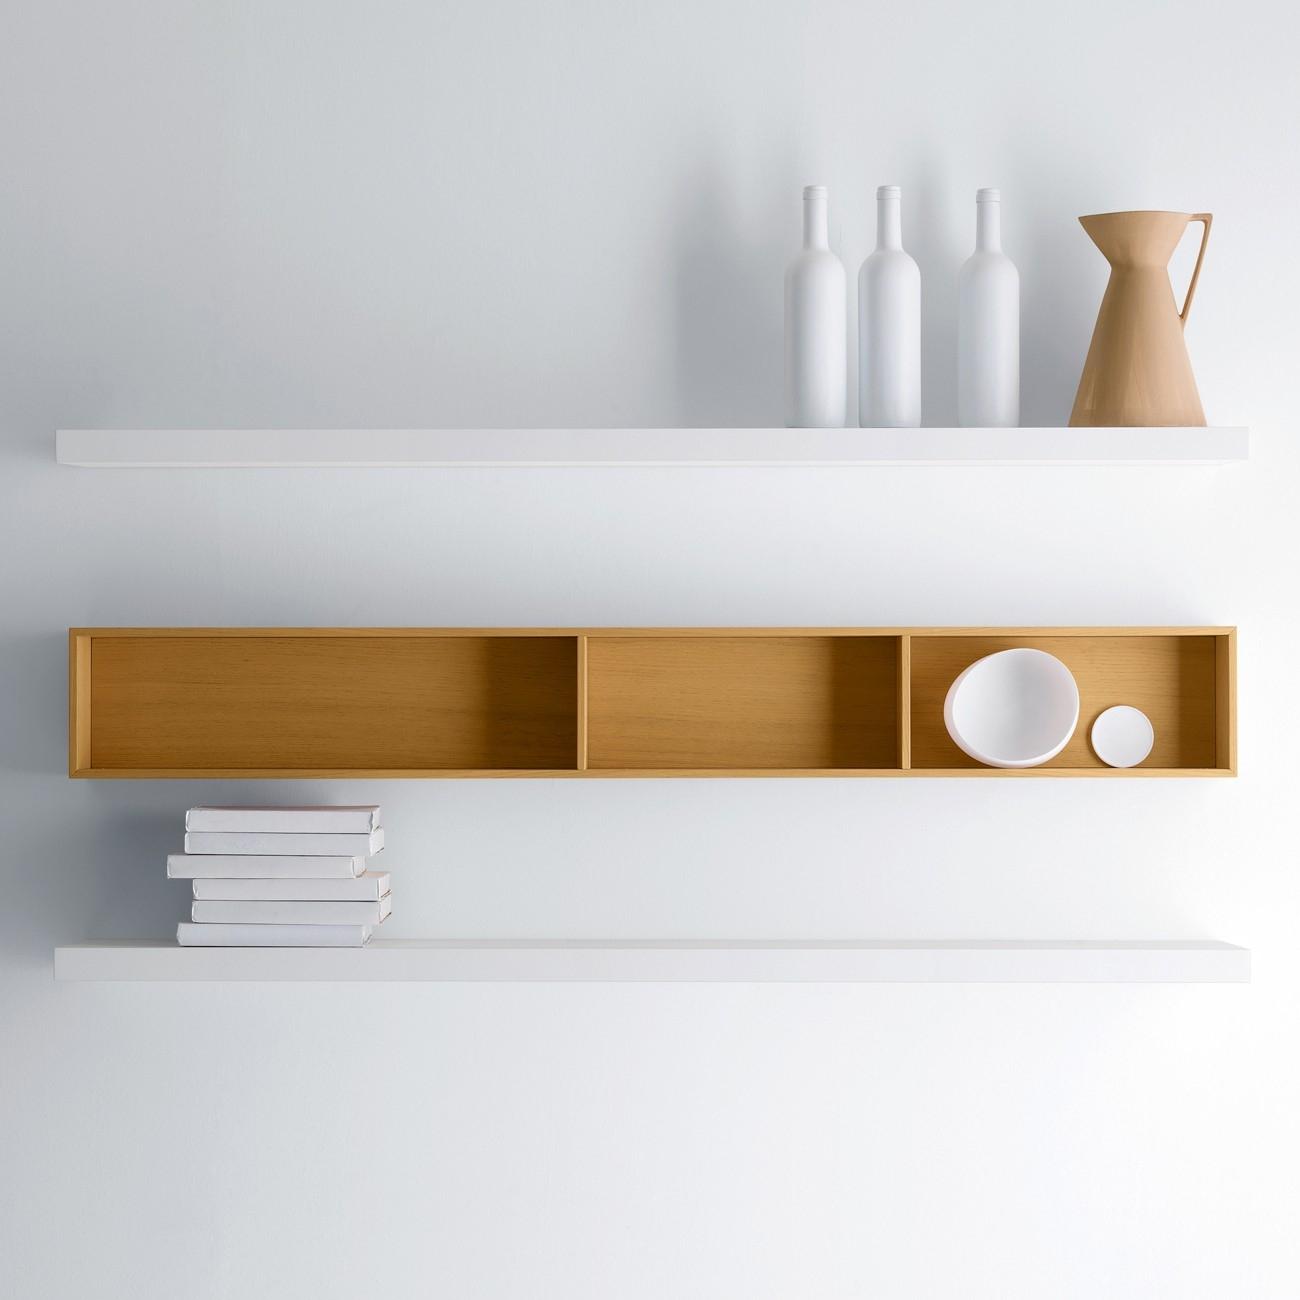 Design Chic Wall Shelves Designs Images Brown Wooden Wall Shelf Inside Wall Shelf (View 2 of 12)